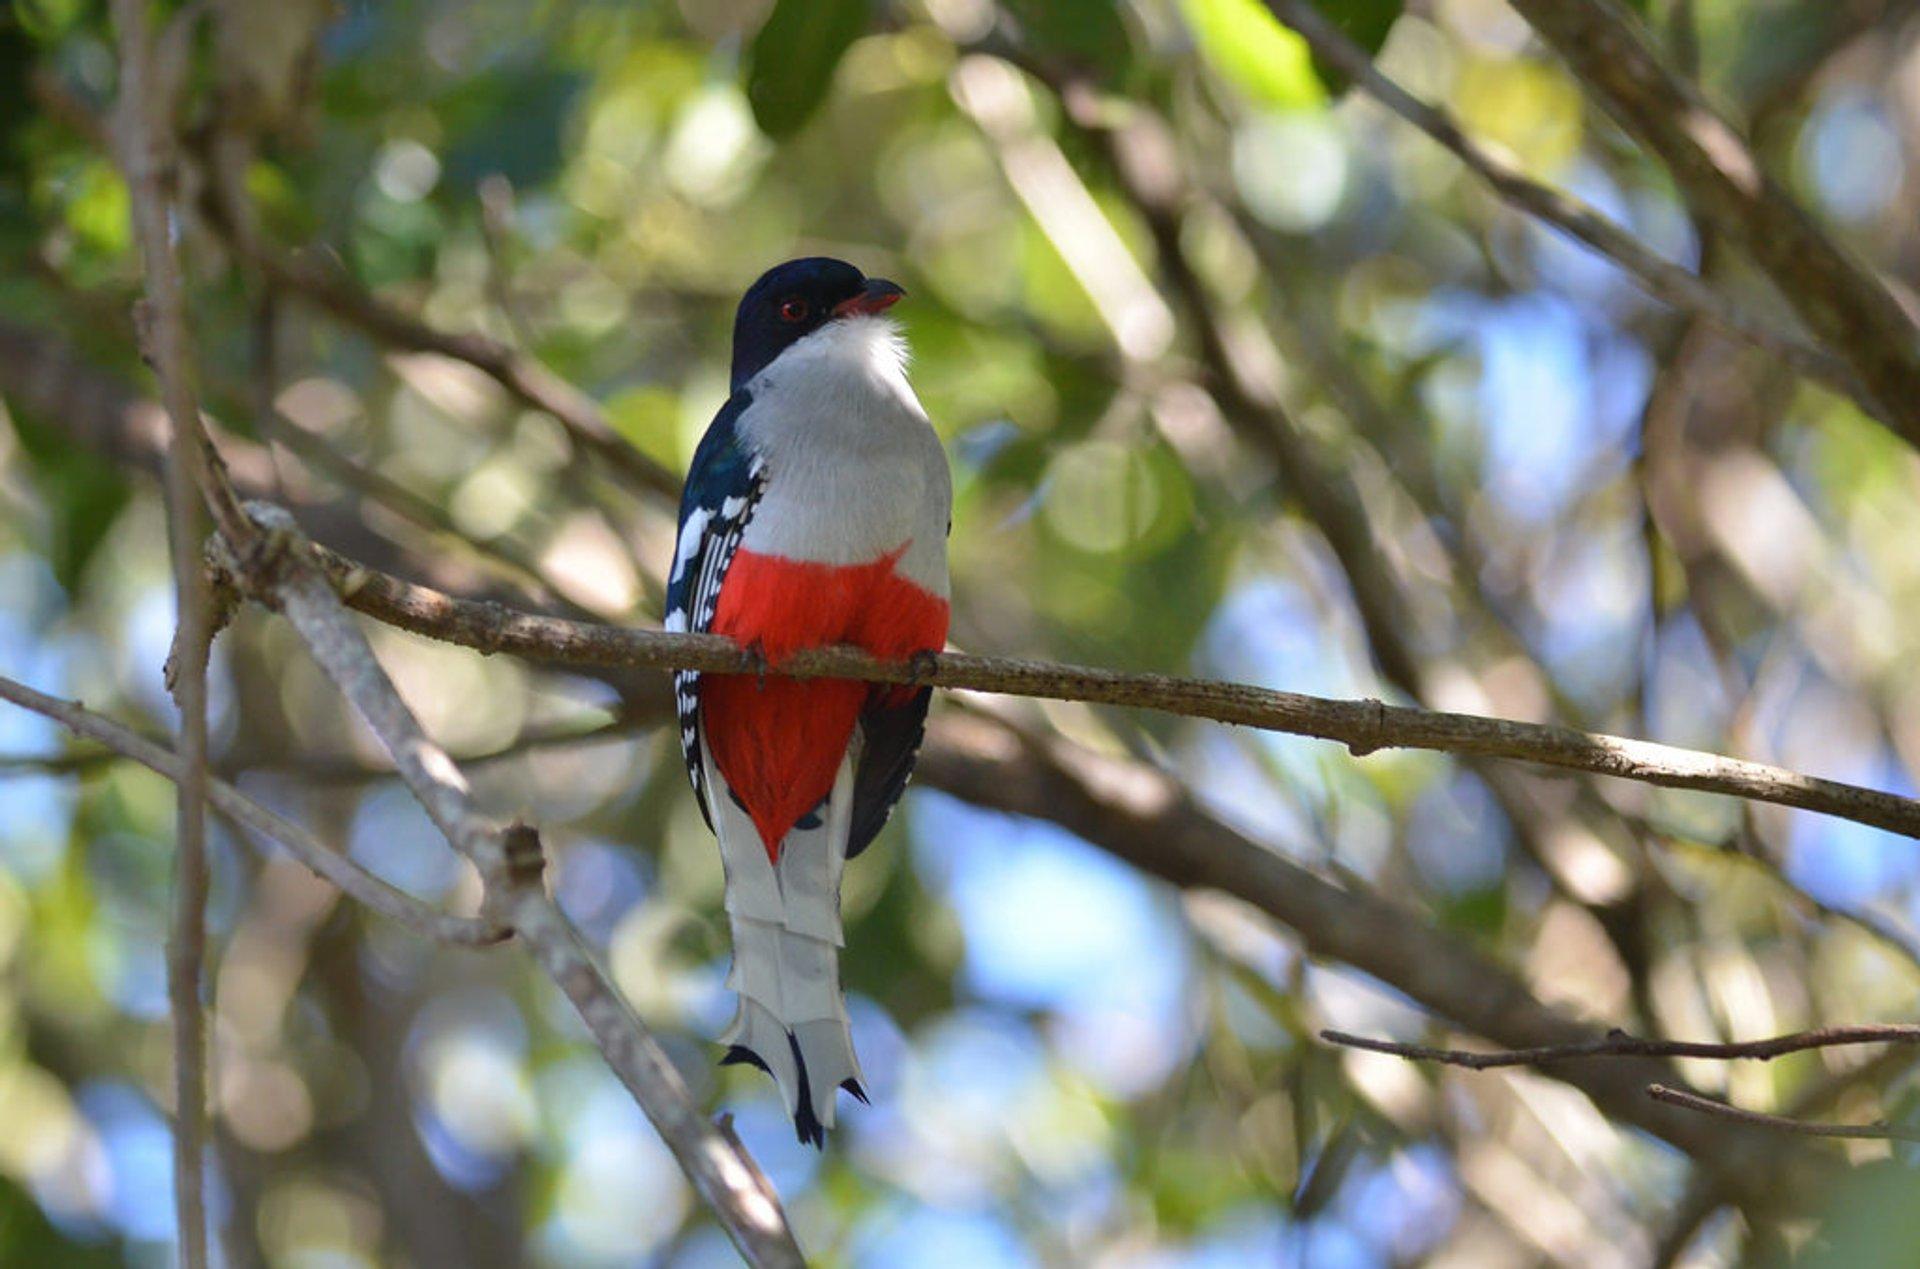 Tocororo (Cuban Trogon) Breeding Season in Cuba 2019 - Best Time